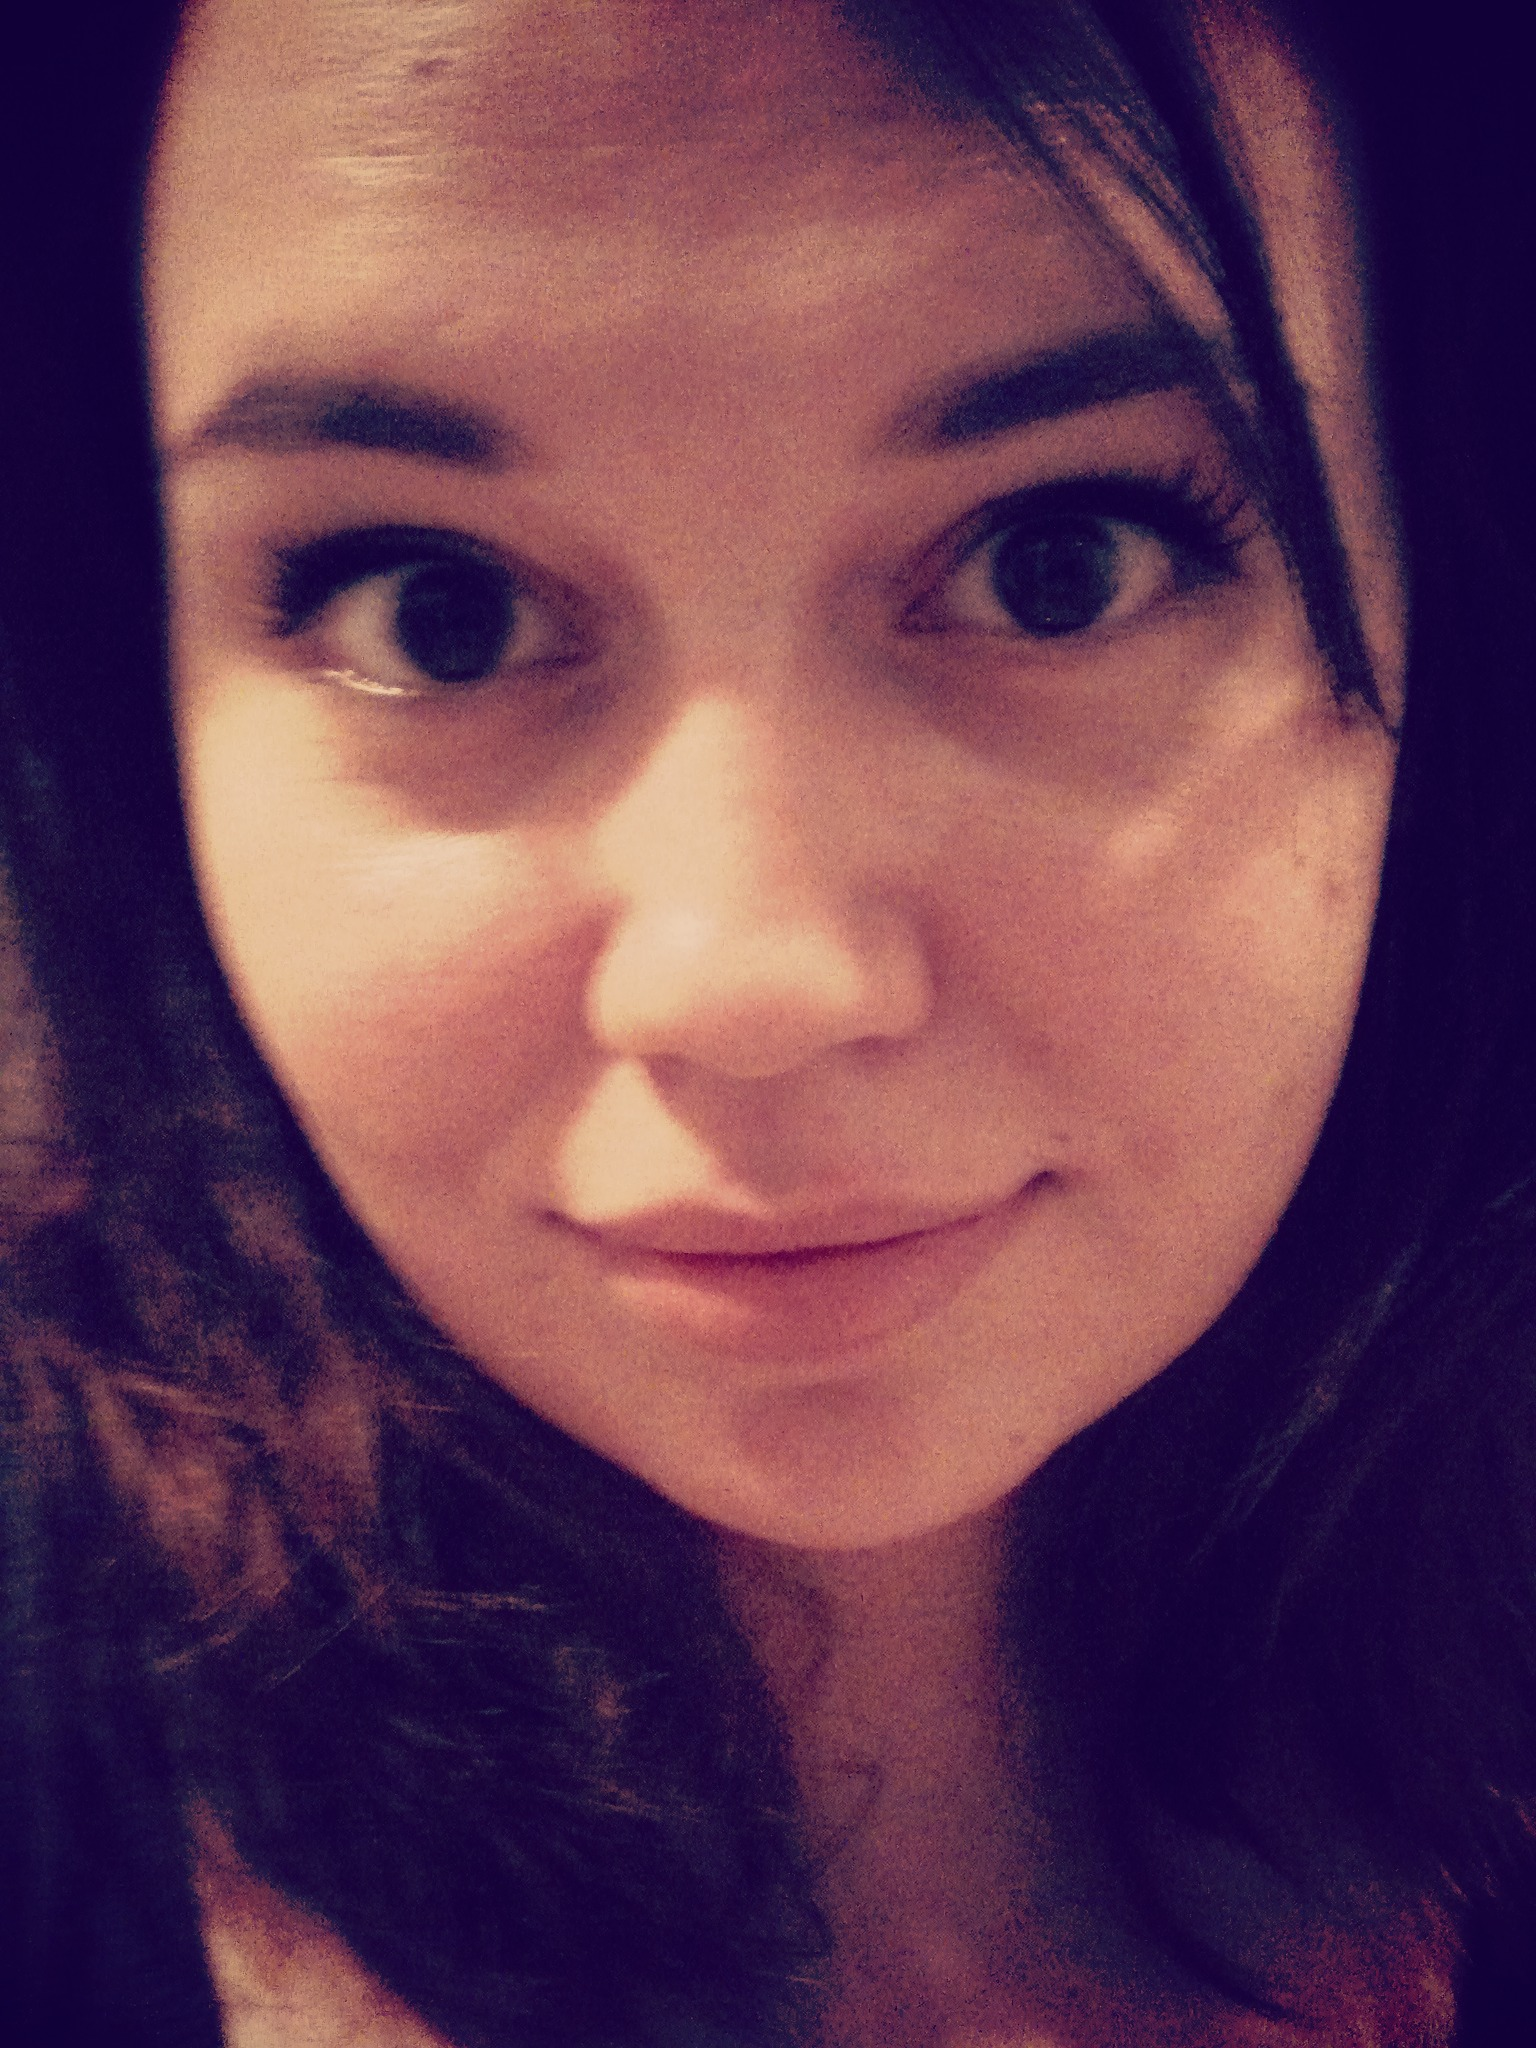 Profile of a Budgeting Mum: Cas Sheppard